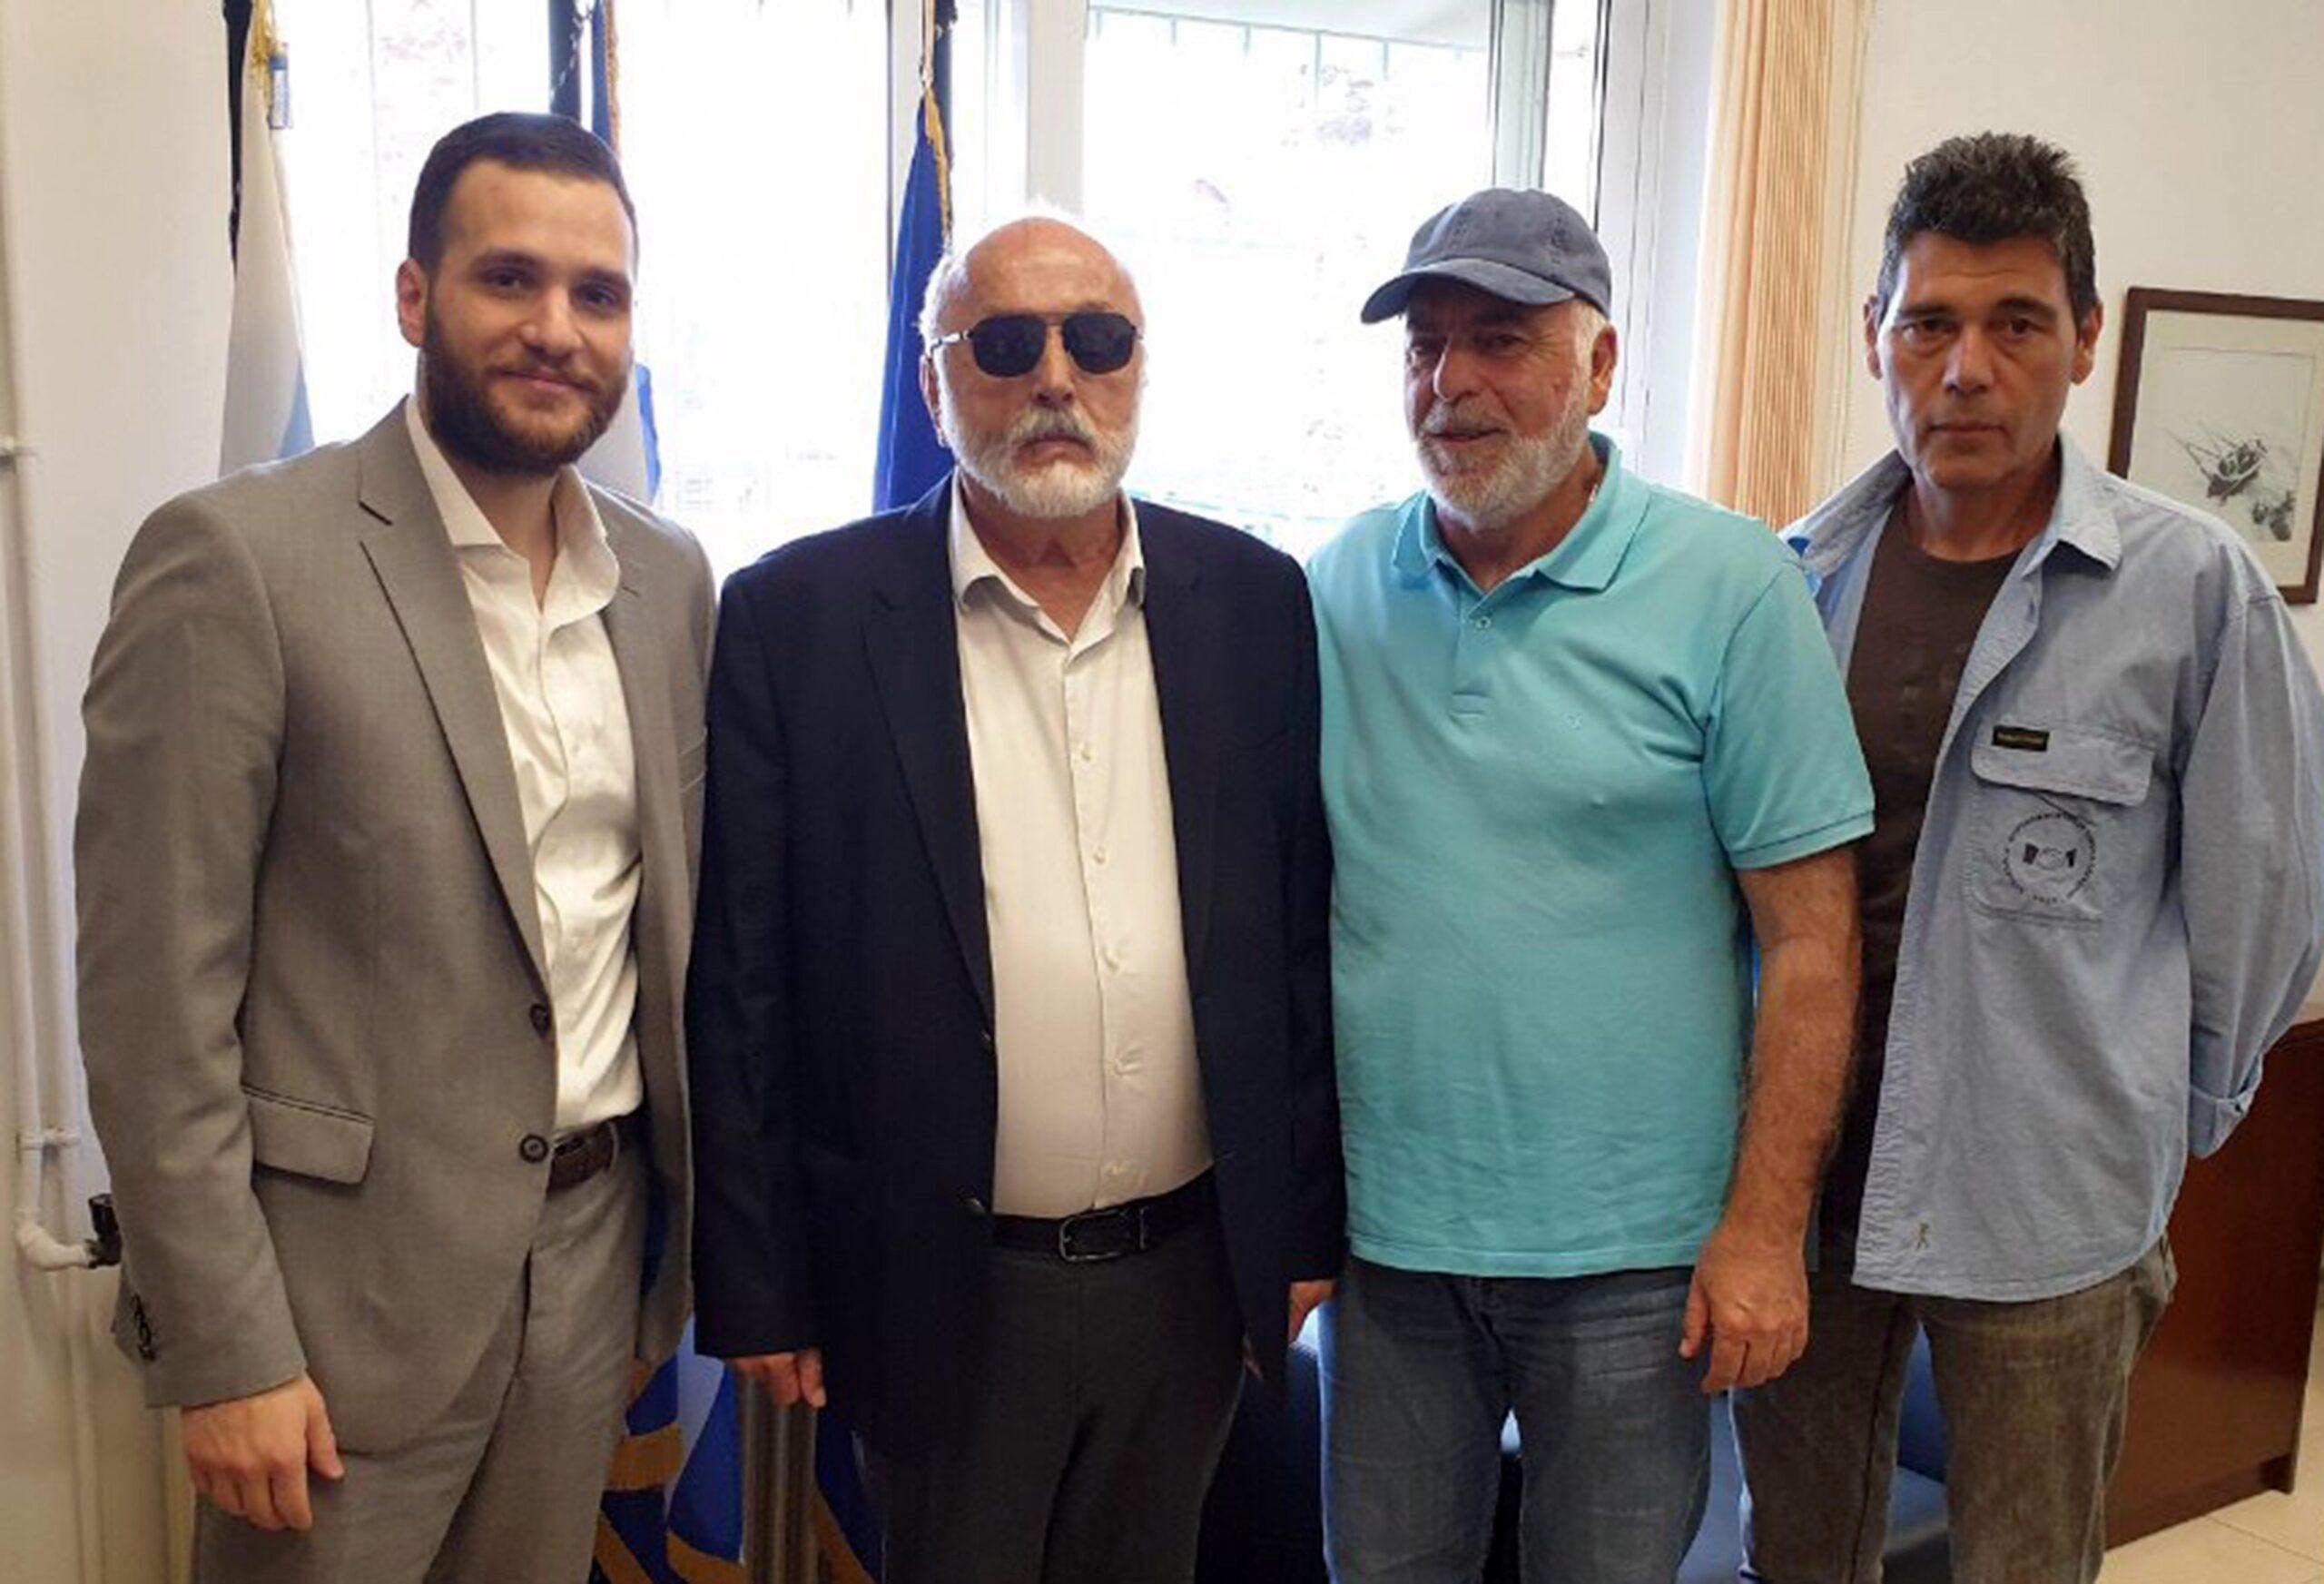 You are currently viewing Επίσκεψη του υποψήφιου Ευρωβουλευτή του ΣΥΡΙΖΑ  κ. Π.Κουρουμπλή στο Λιμάνι Ελευσίνας